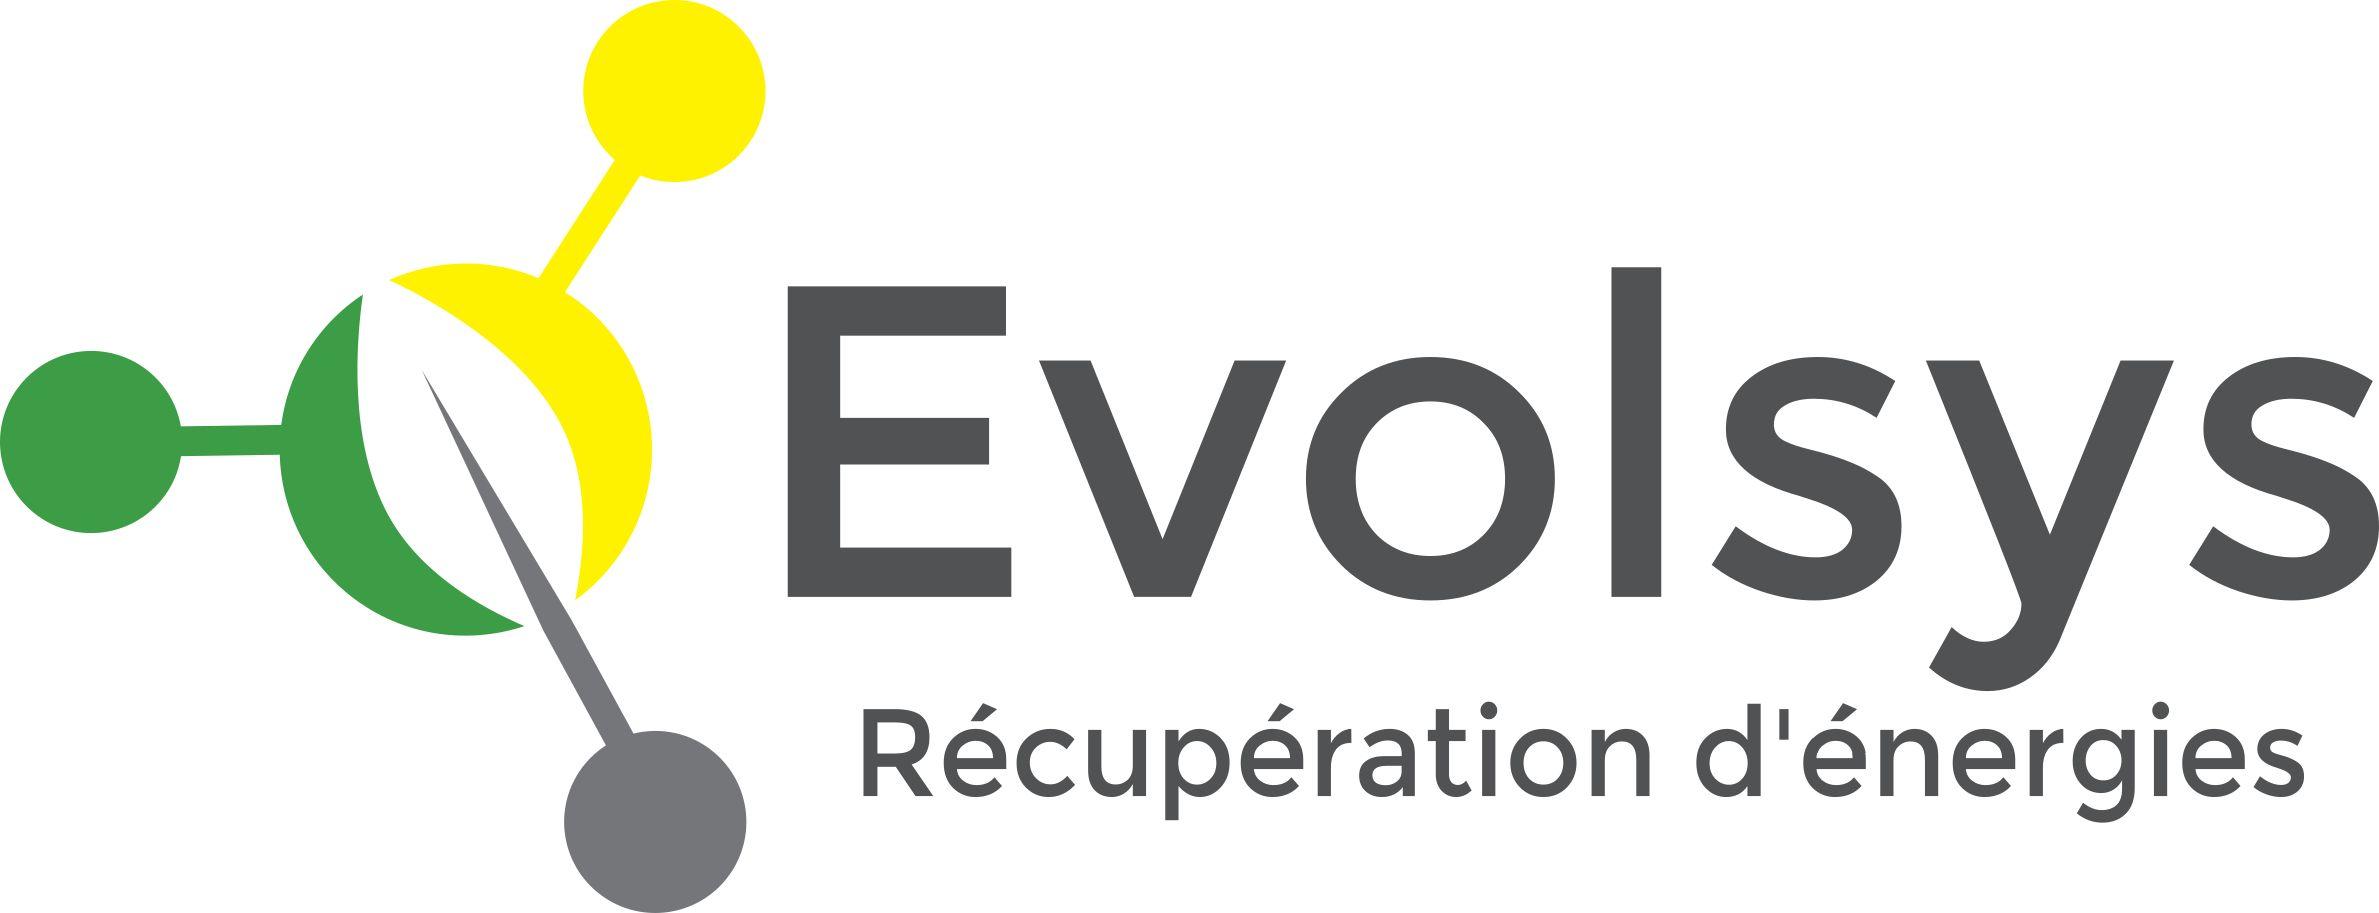 orgineel-logo-evolsys